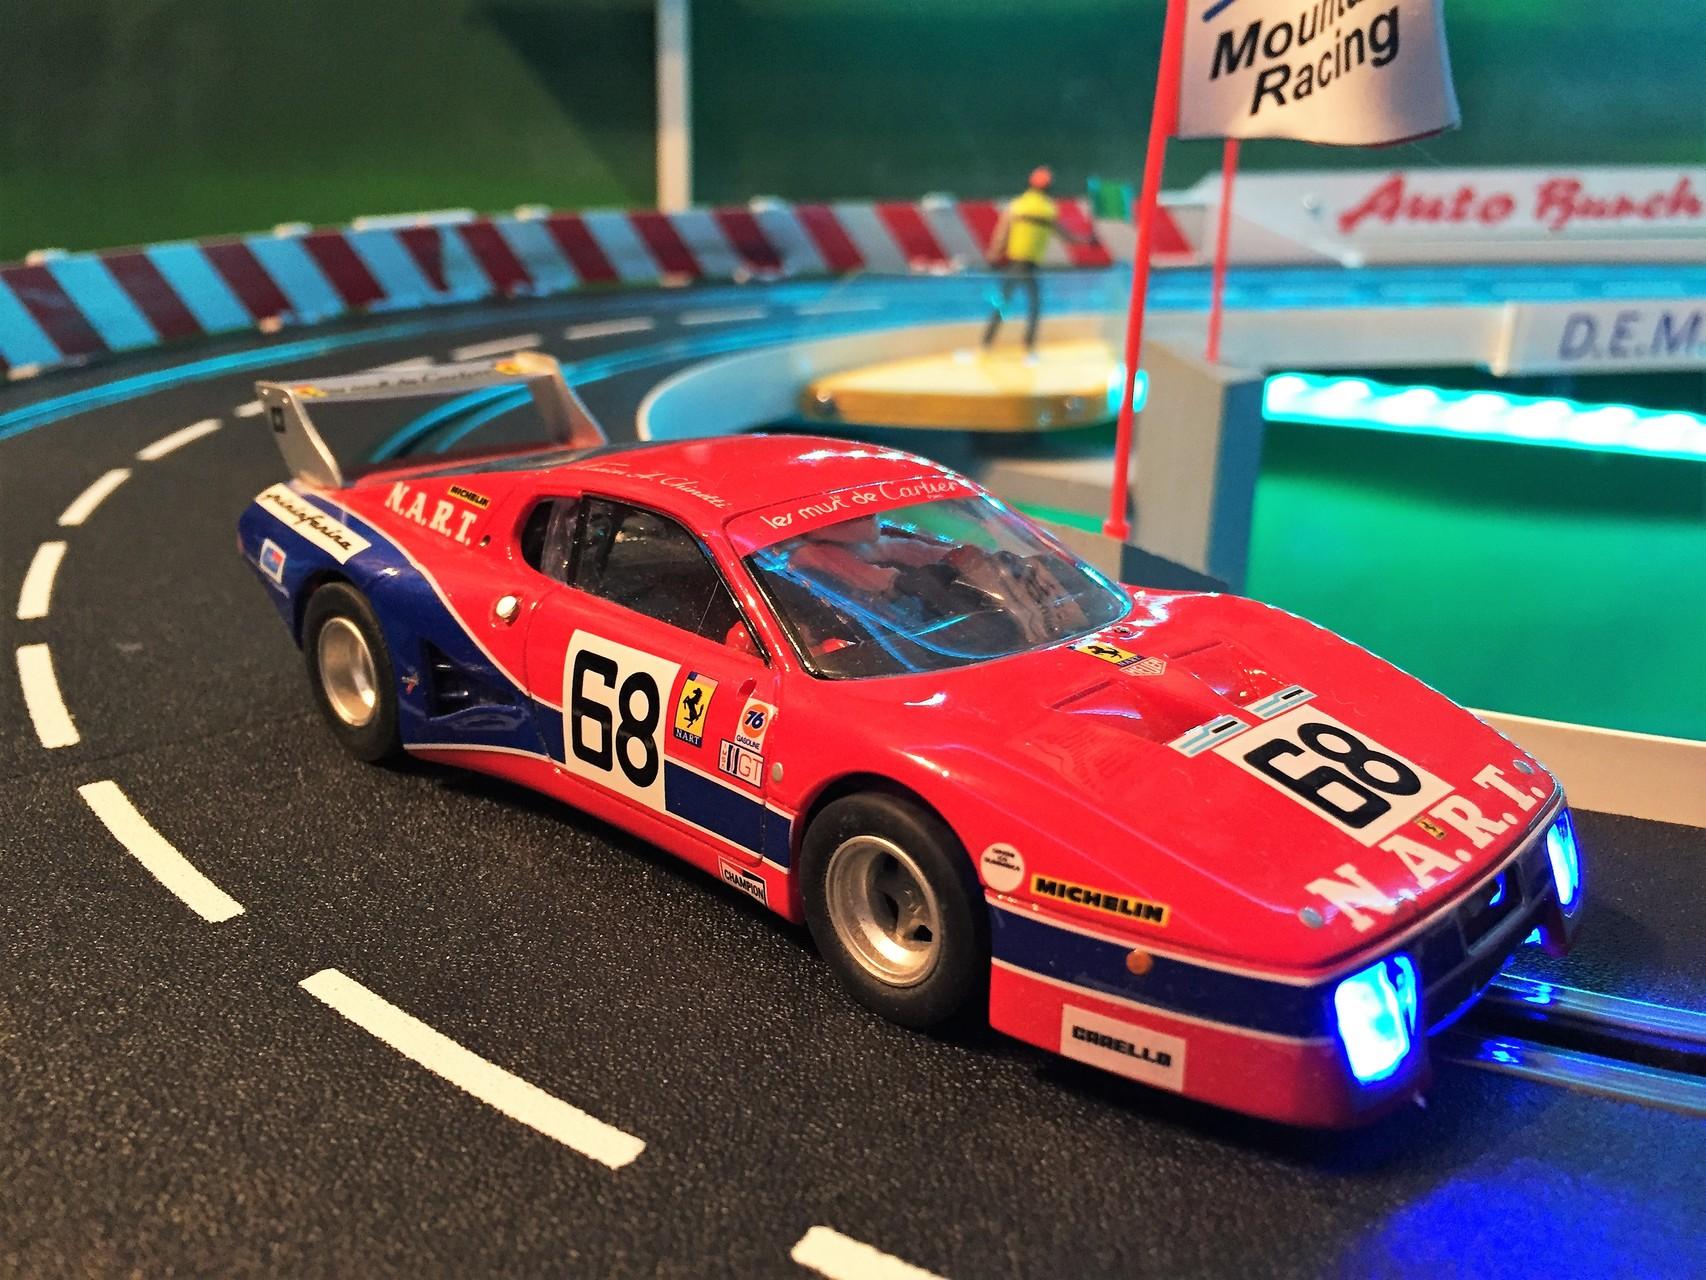 Ferrari 512 BB LM Daytona